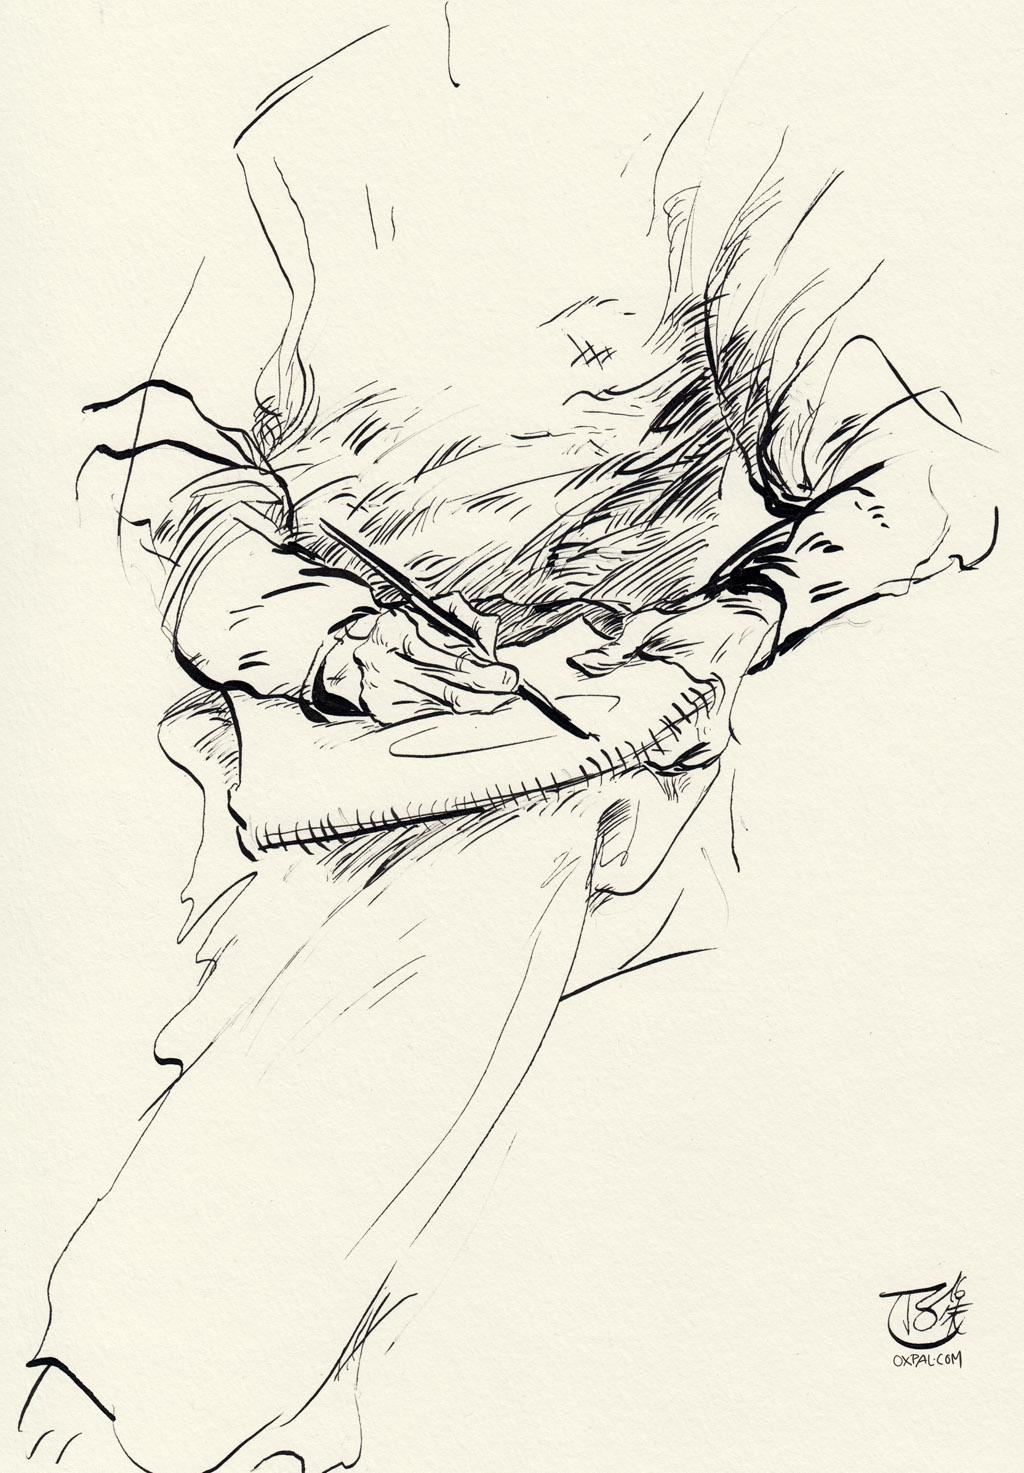 Artist drawn